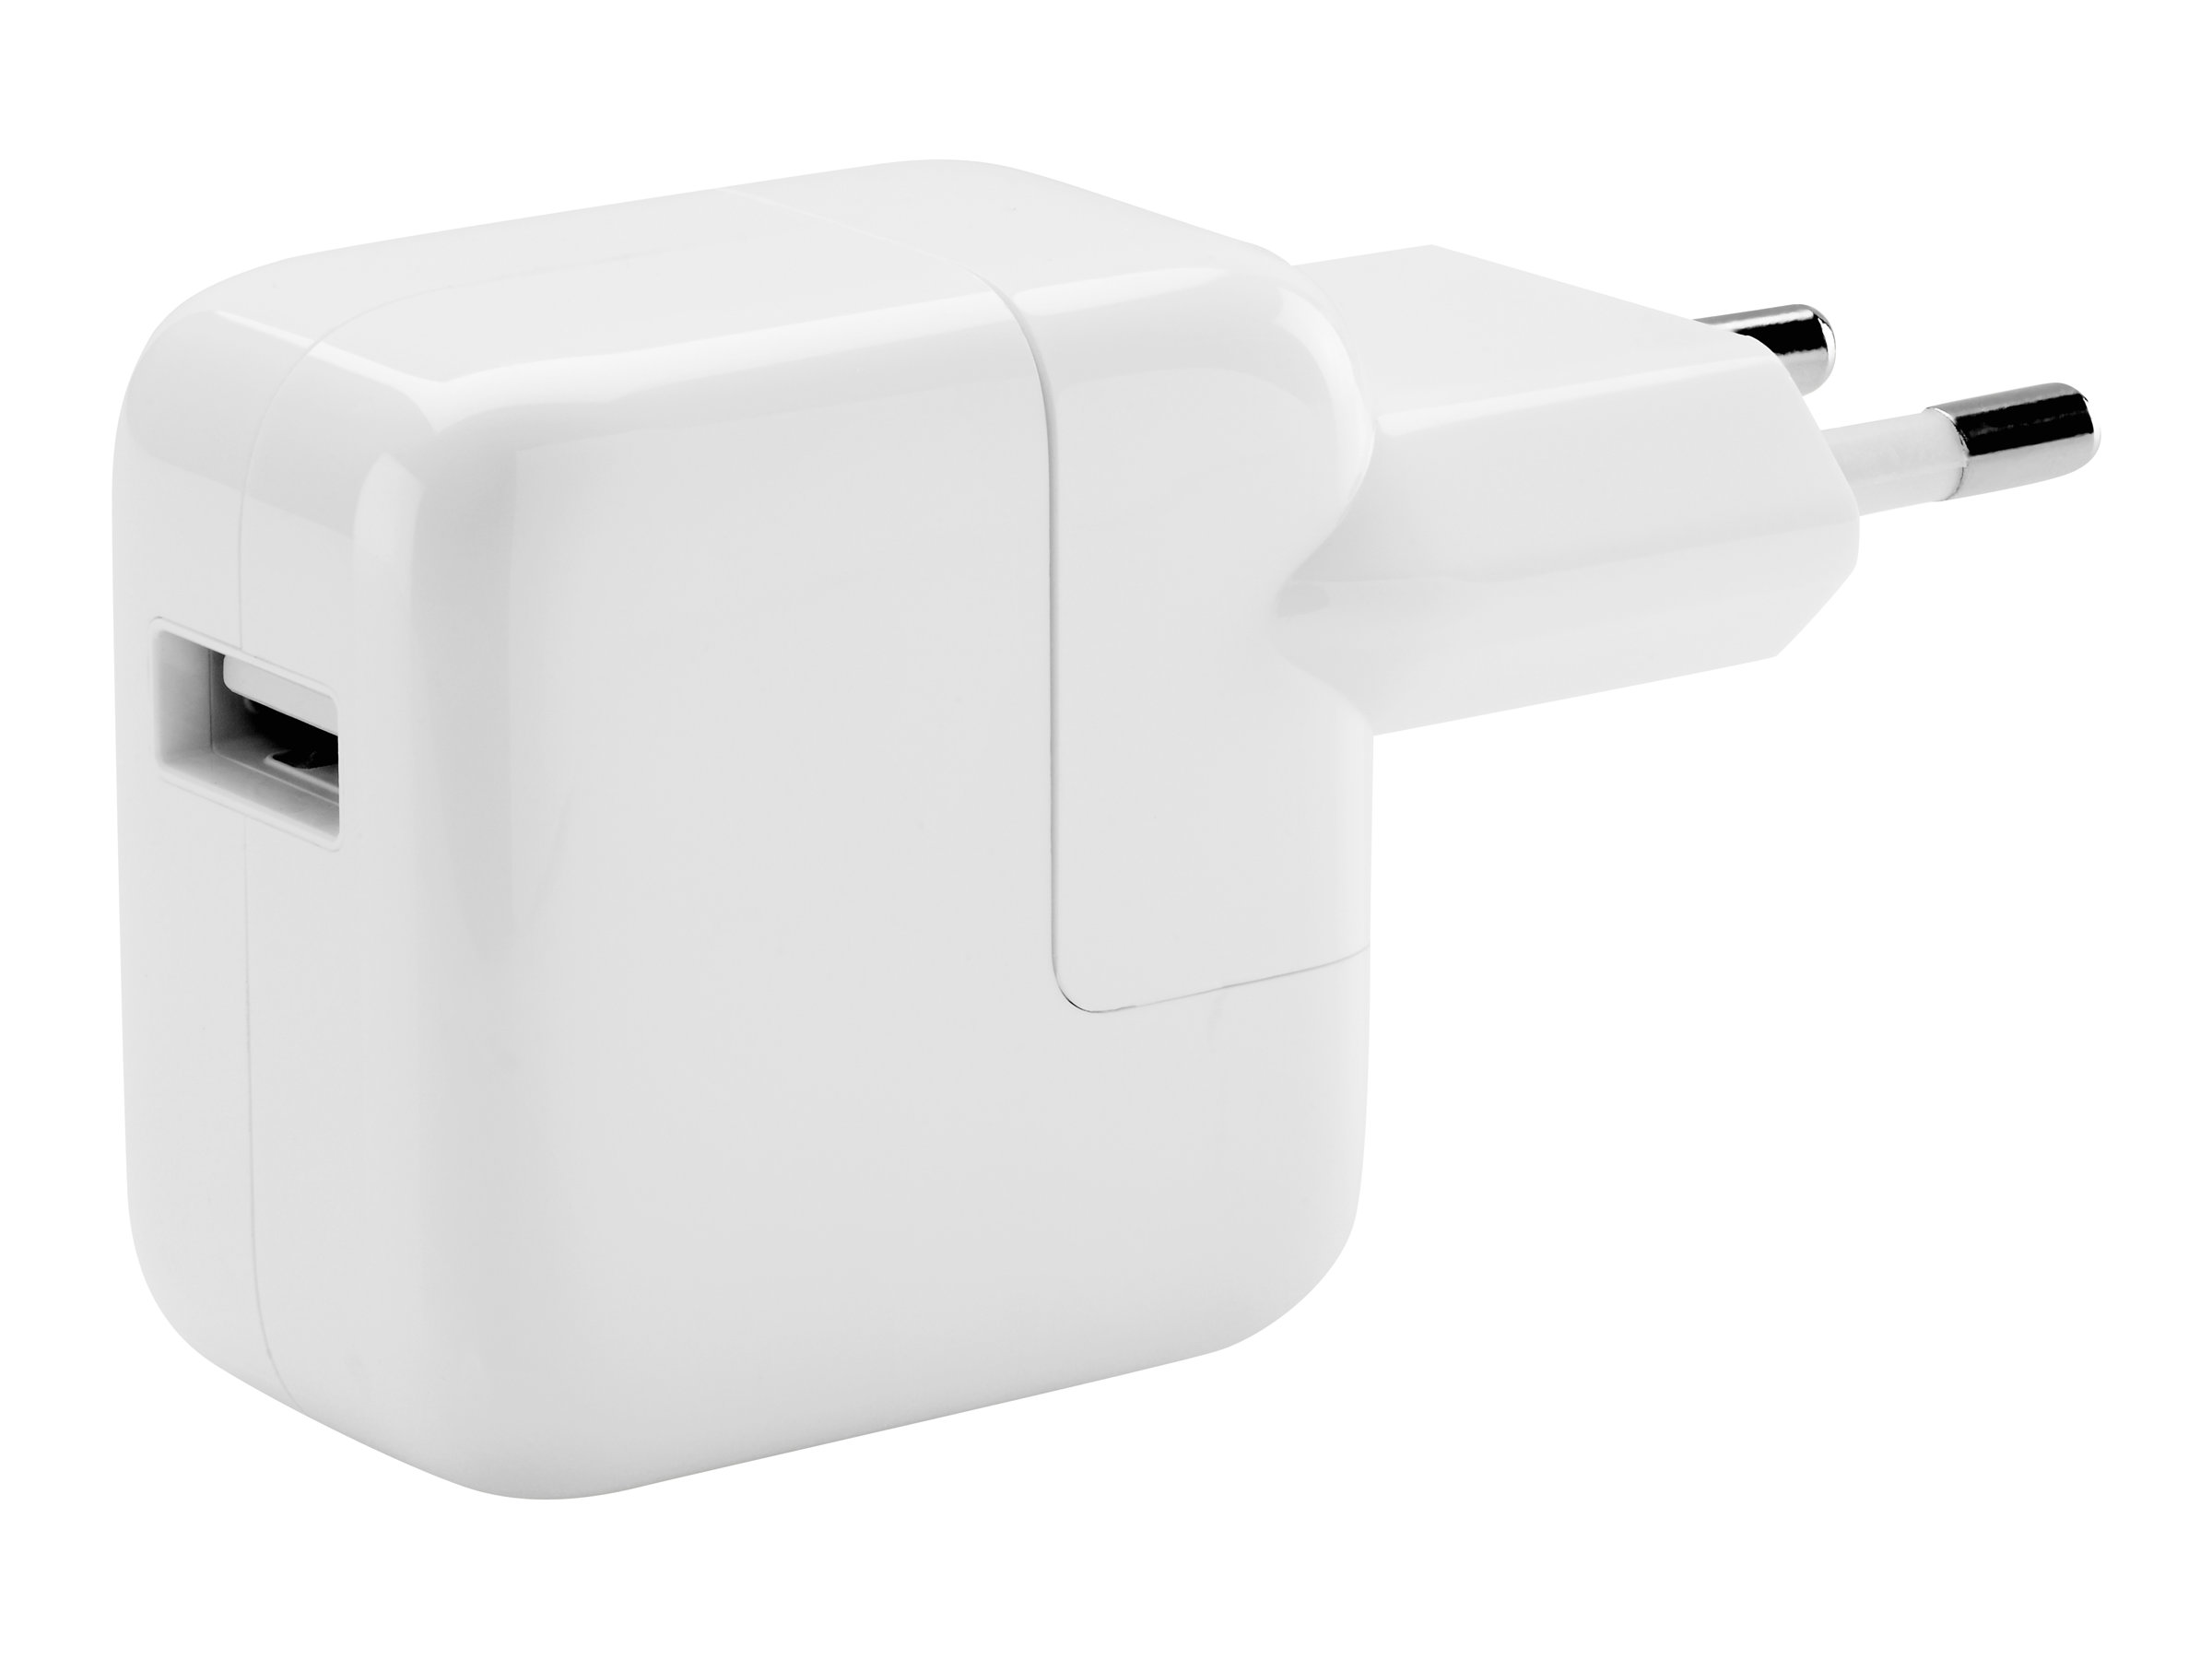 Apple 12W USB Power Adapter - Netzteil - 12 Watt (USB)